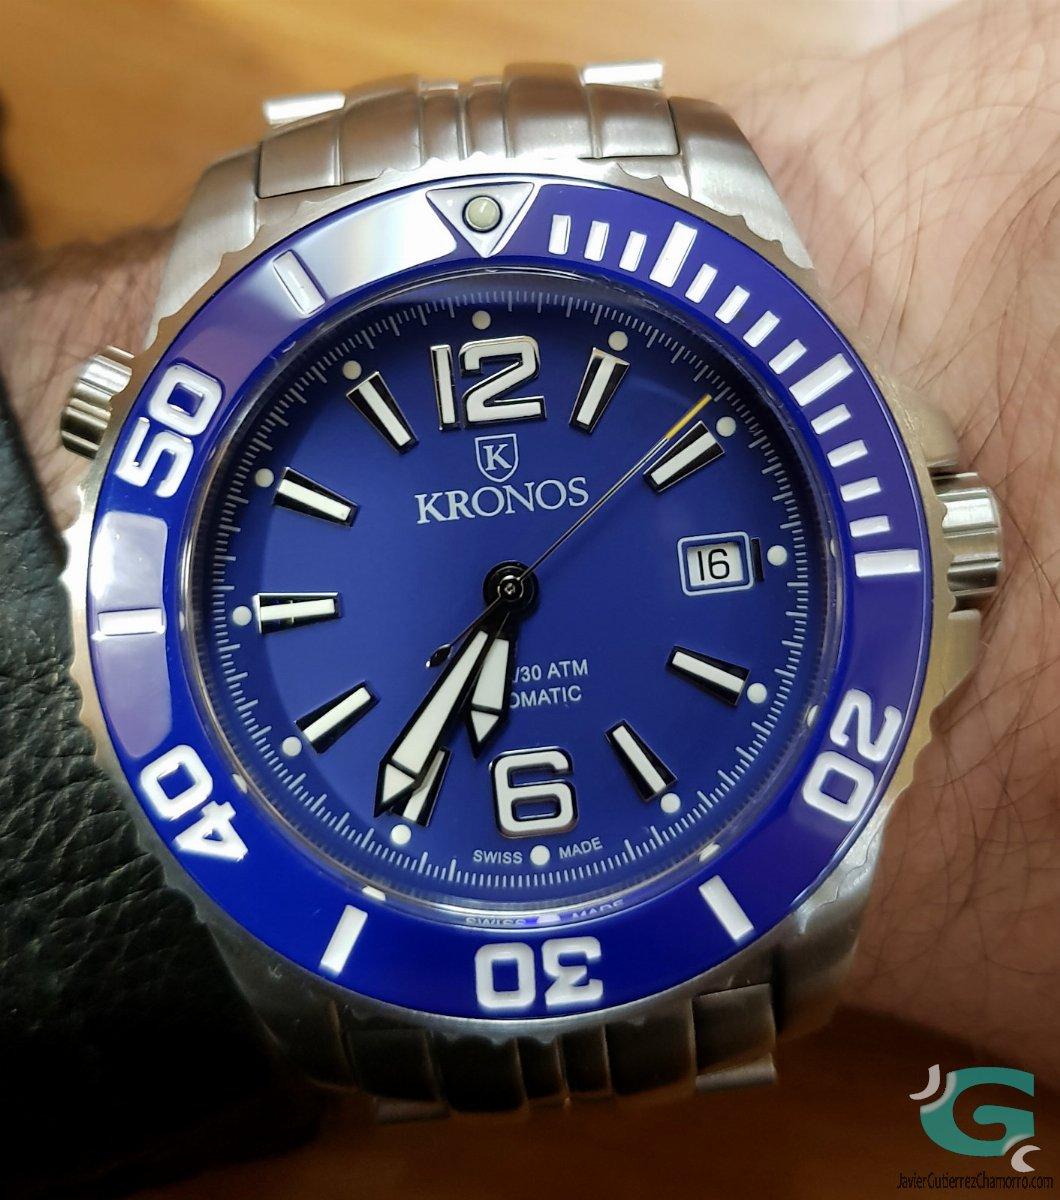 2a589235bf93 Kronos K300 Automatic Blue